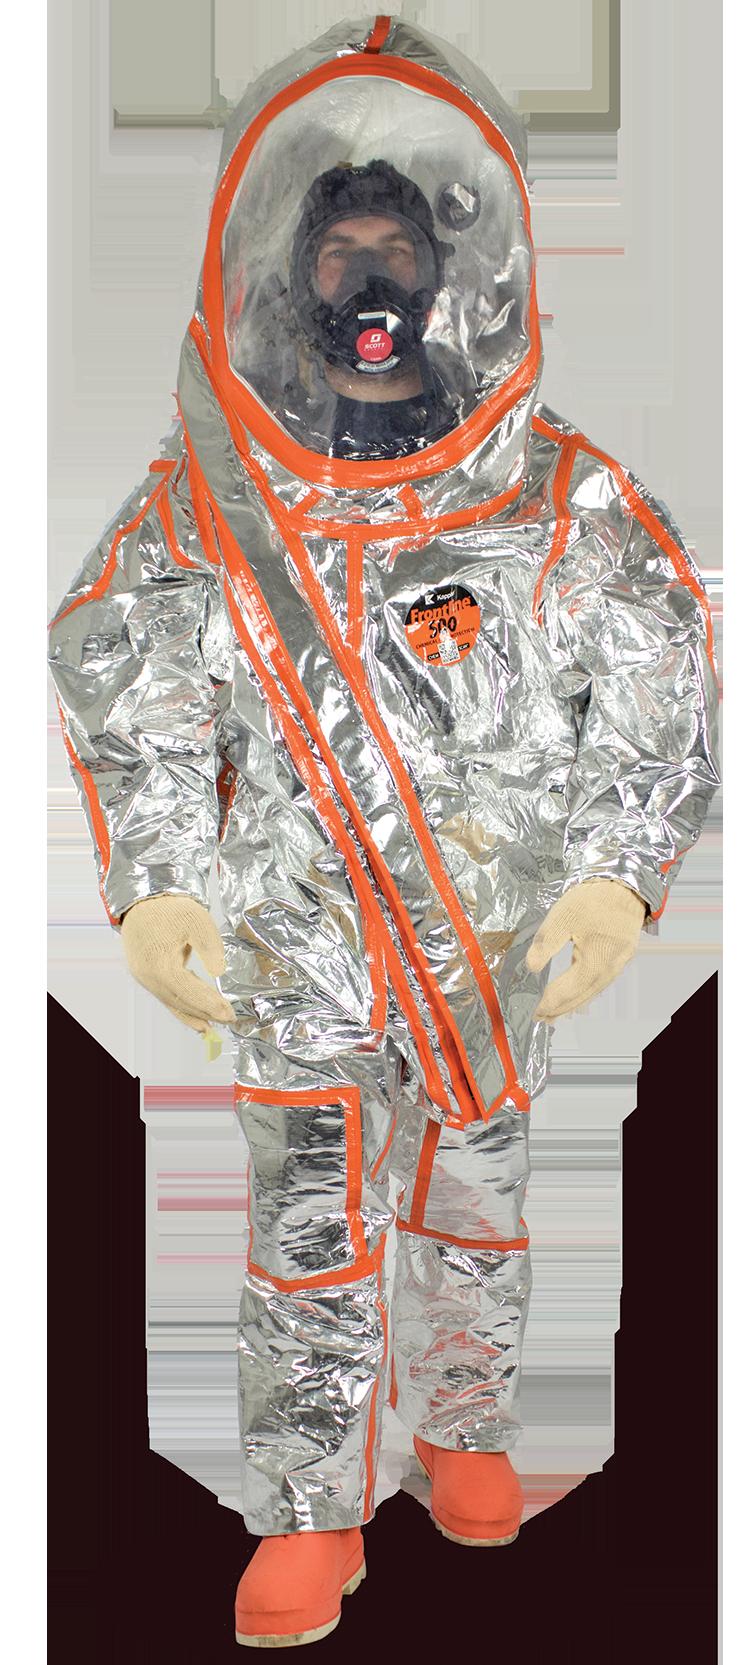 Frontline 500 vapor total encapsulating suit with expanded view antifog visor system